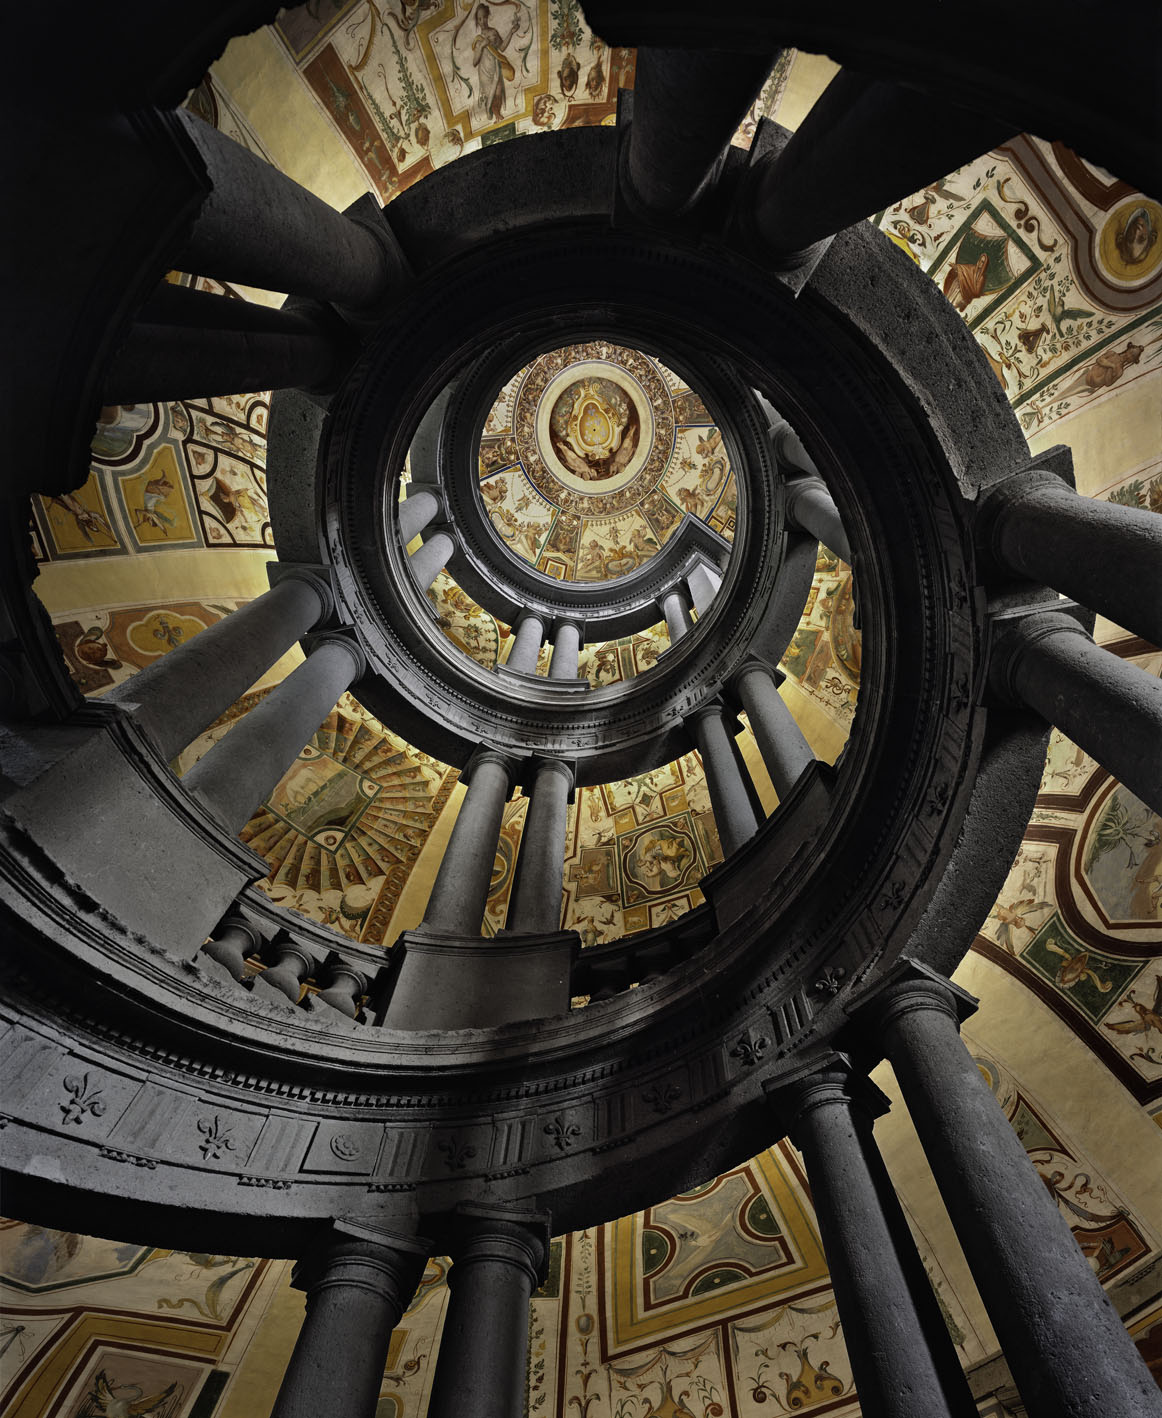 Ertug, Villa Farnese Royal Stairs, Caprorola, Italy